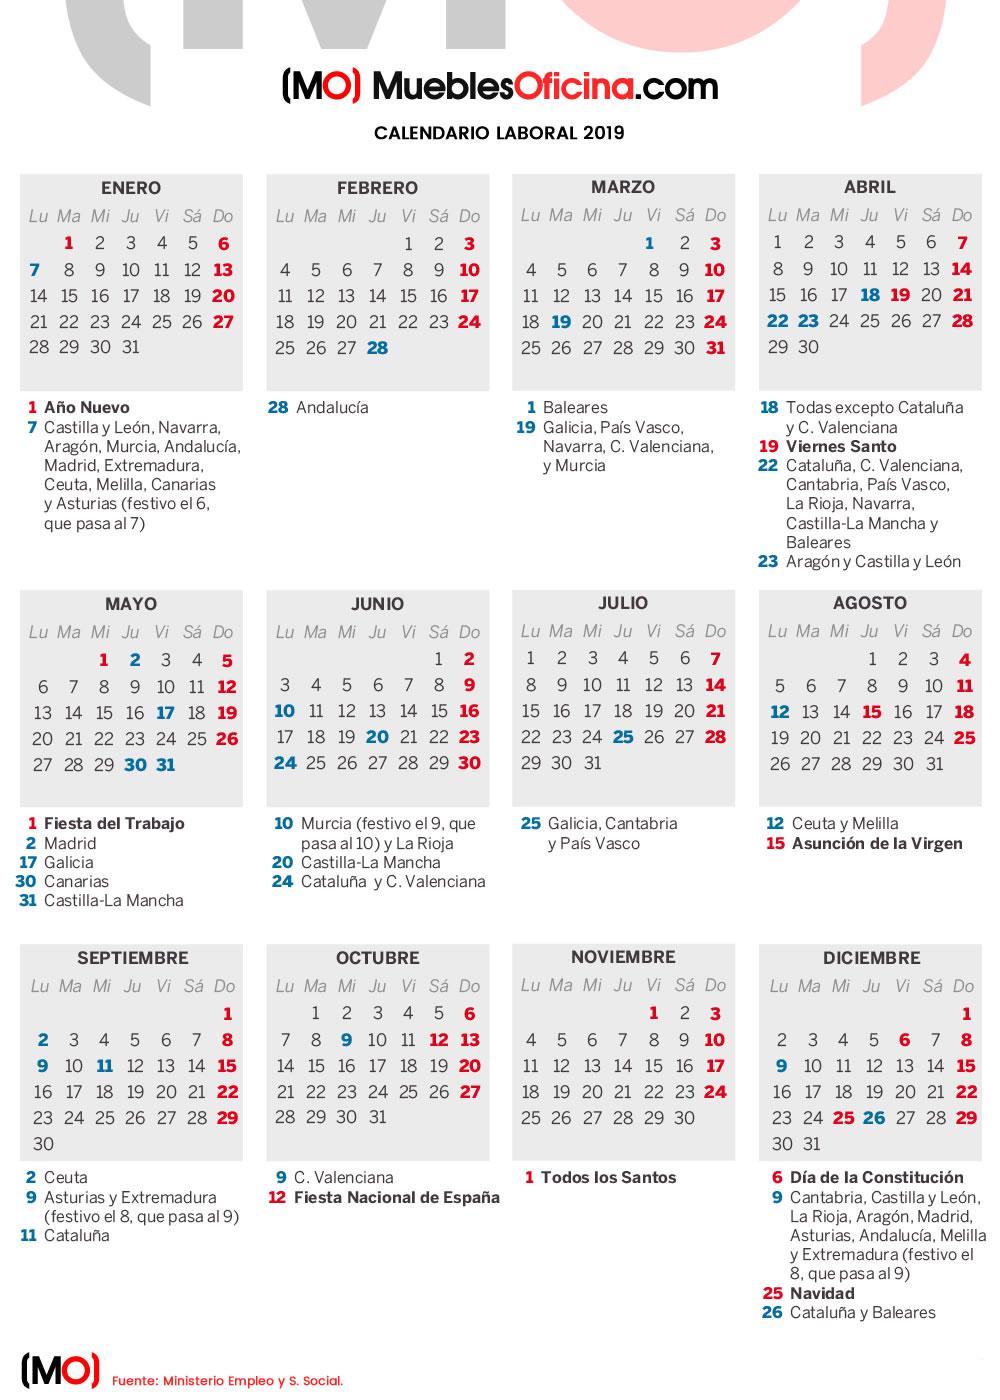 Calendario Laboral 2019 Andalucia.Calendario Laboral 2019 De Espana Muebles De Oficina